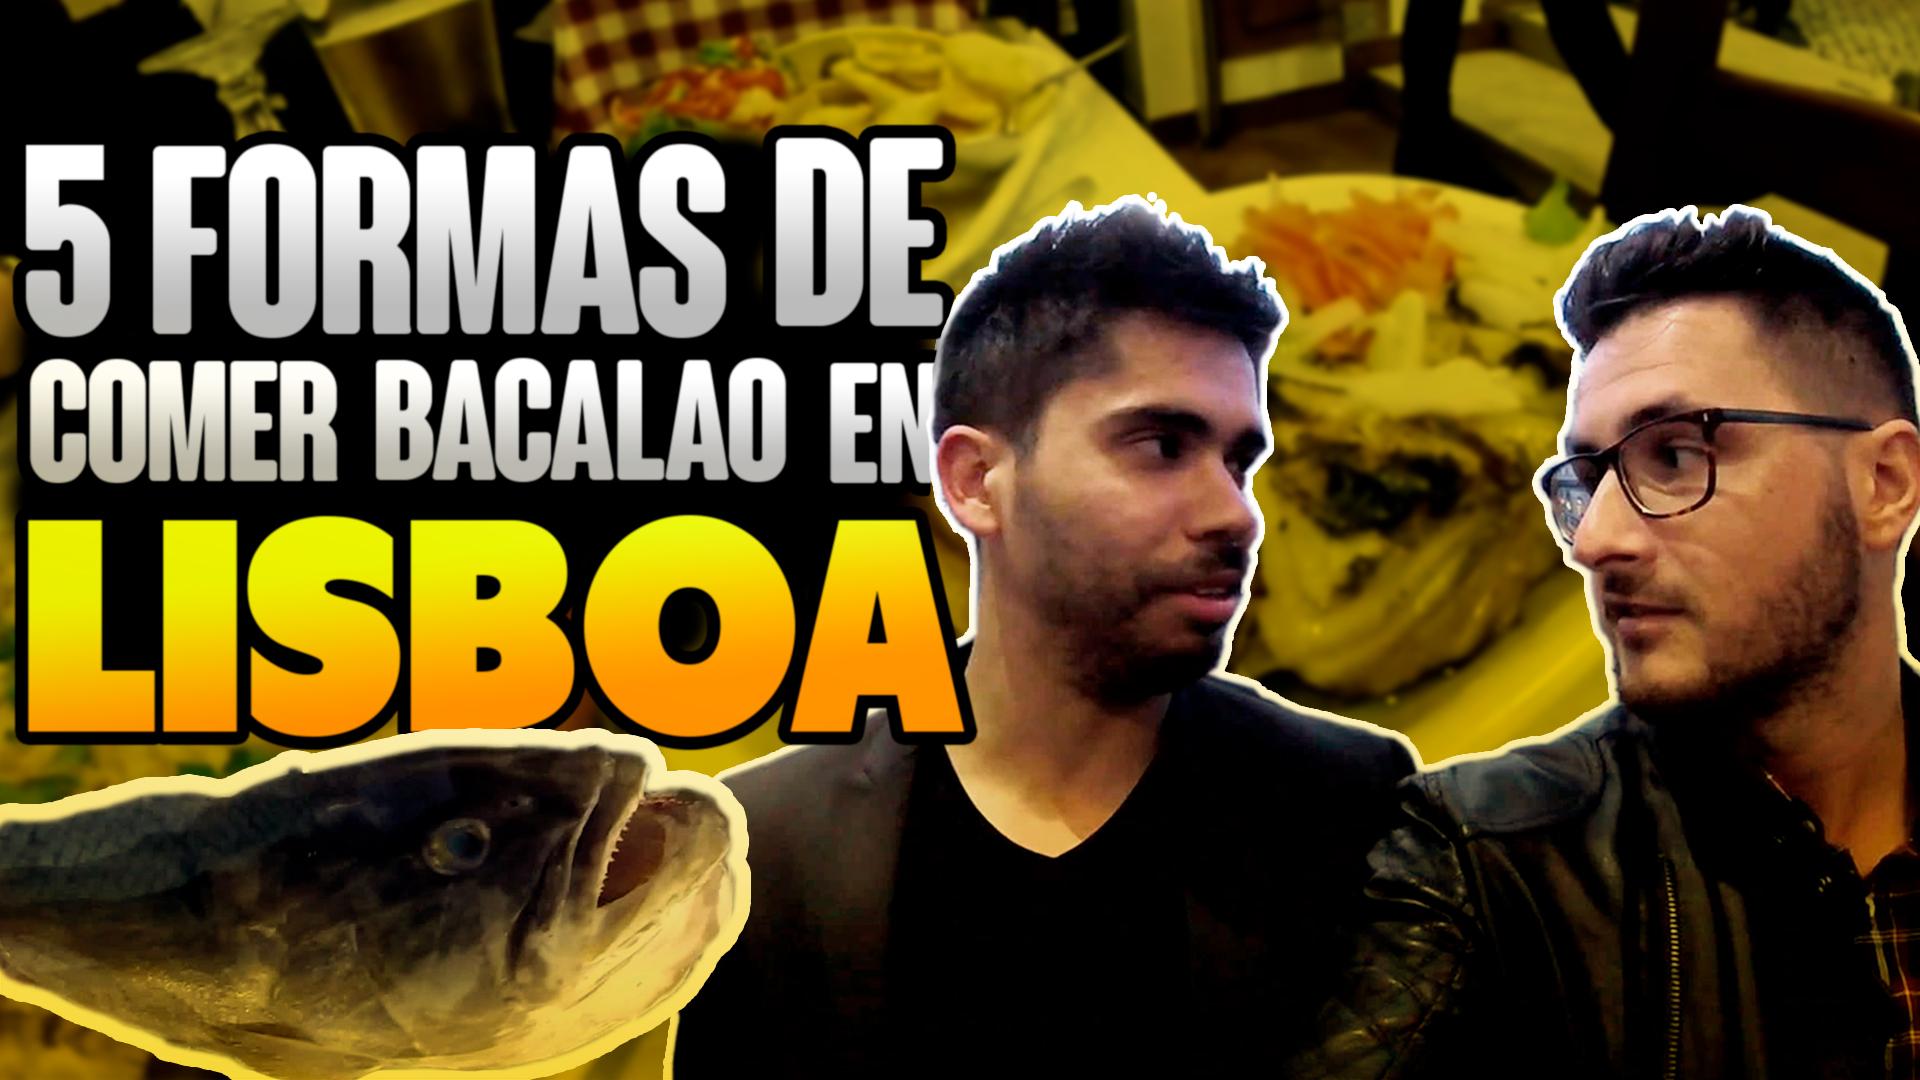 Temporada 1  Bacalao cocinado de 5 formas diferentes en Lisboa